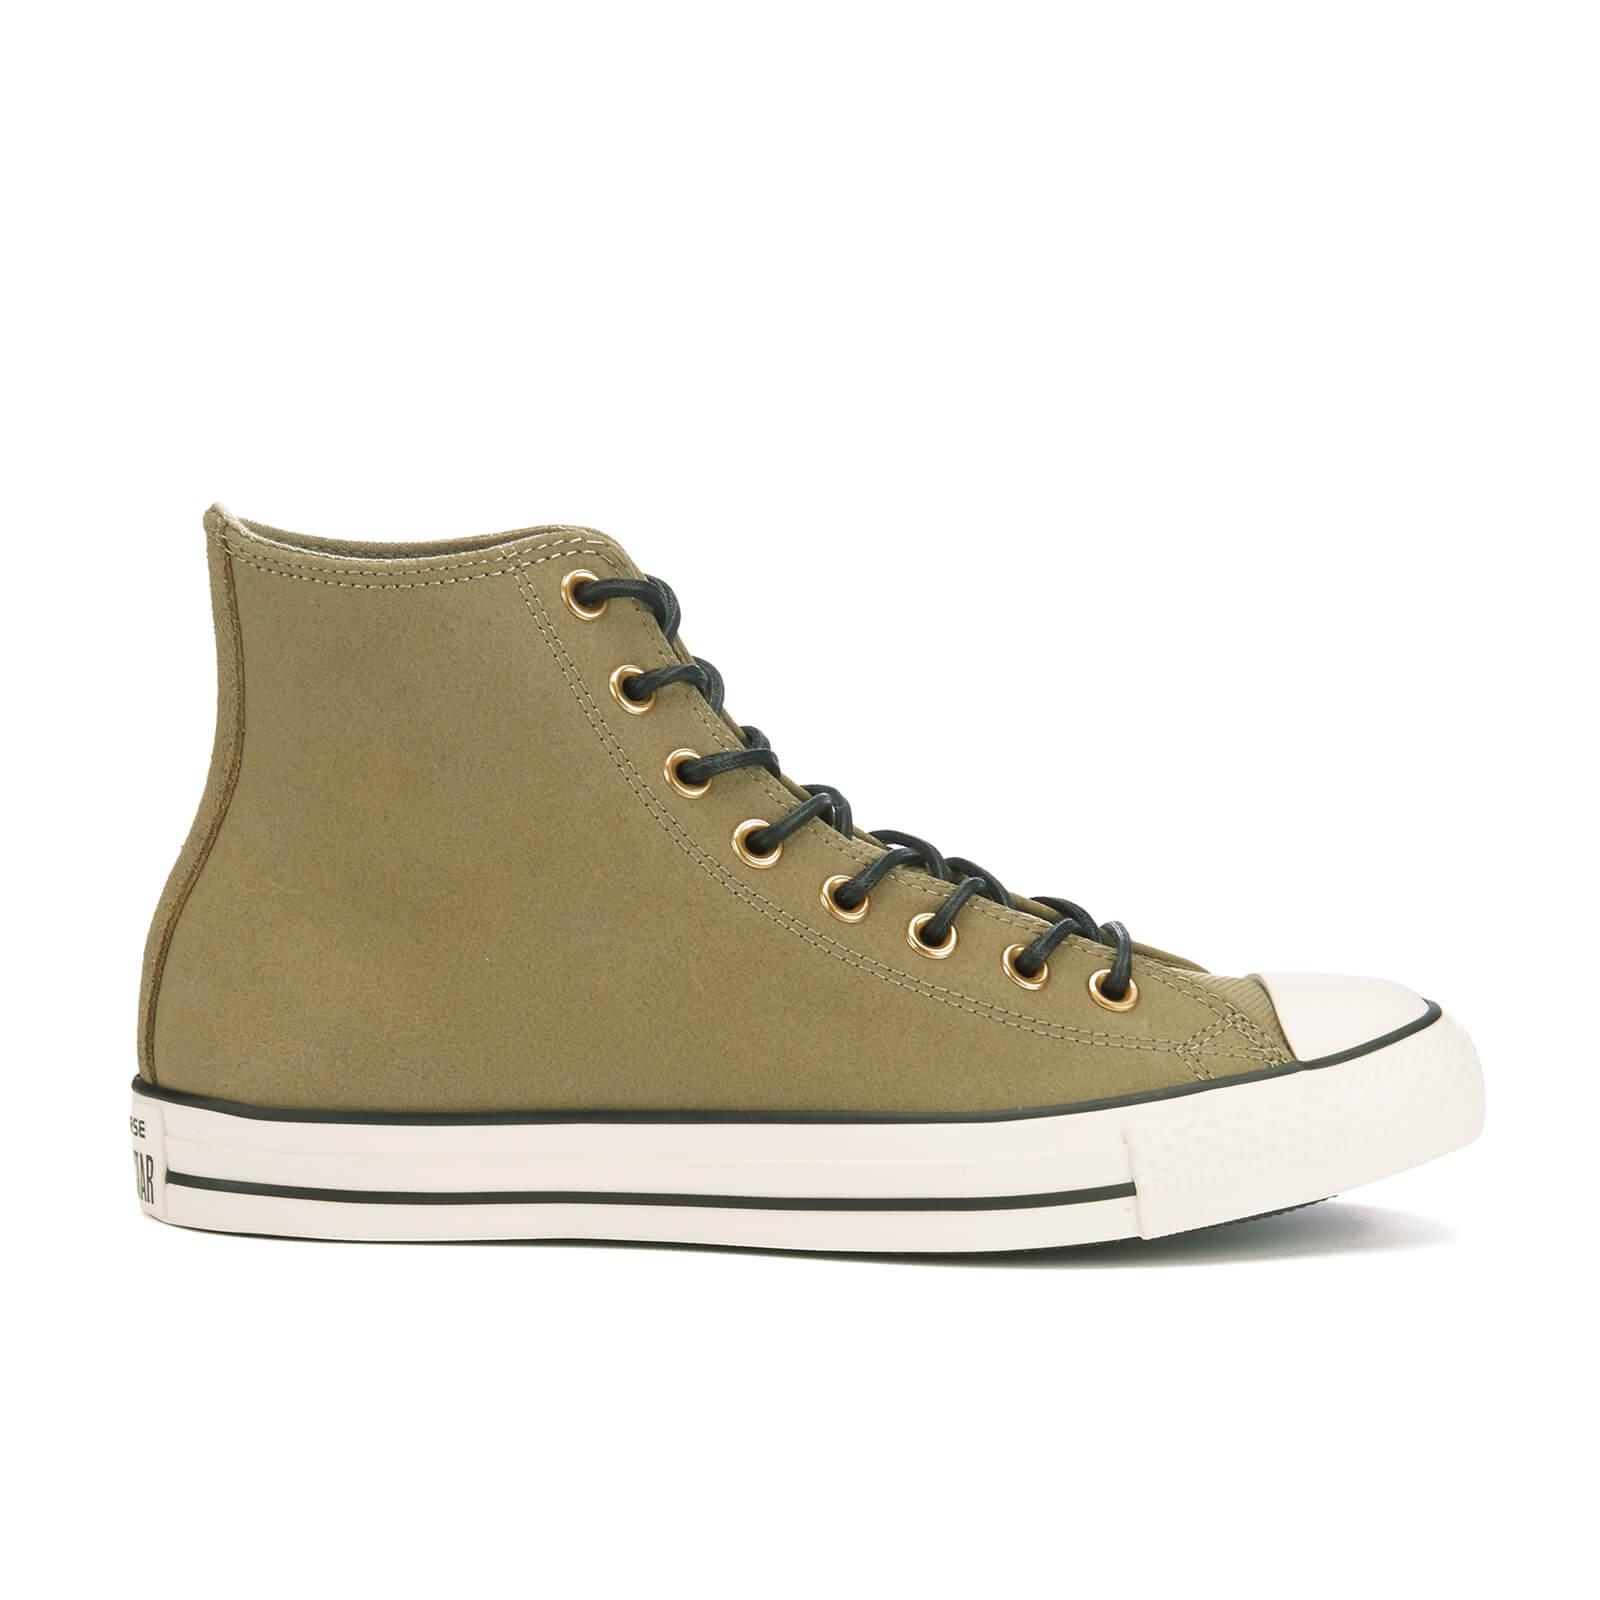 ff4a9668ac7e Converse Men s Chuck Taylor All Star Leather Corduroy Hi-Top Trainers -  Jute Egret Black Mens Footwear